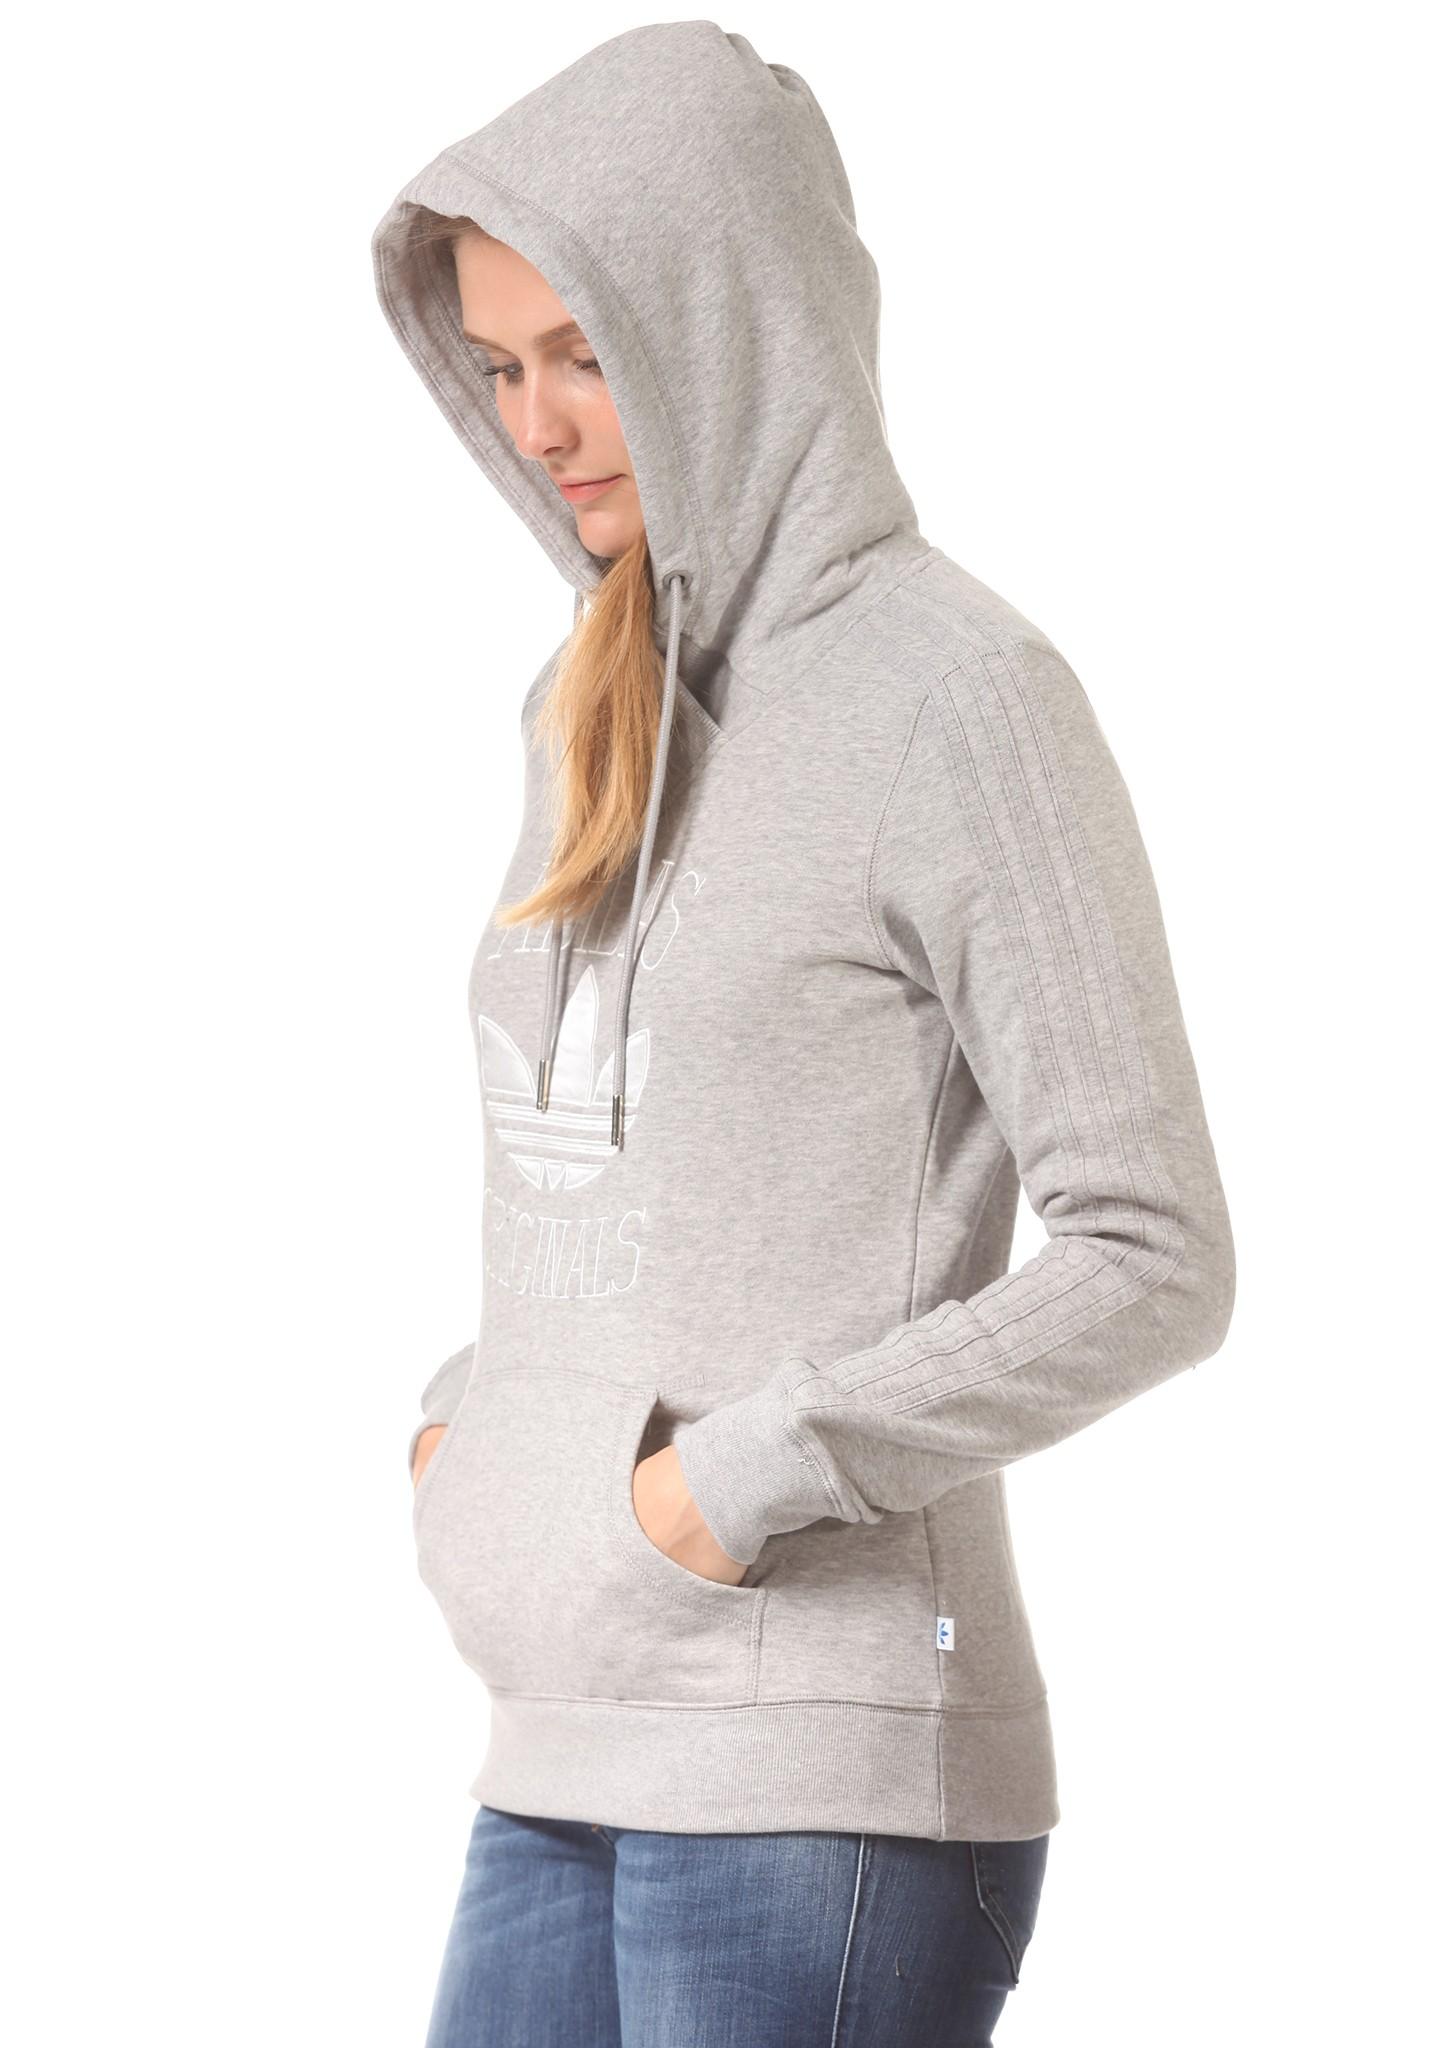 neu adidas slim damen kapuzenpullover pullover hoodie kapuzenjacke ebay. Black Bedroom Furniture Sets. Home Design Ideas